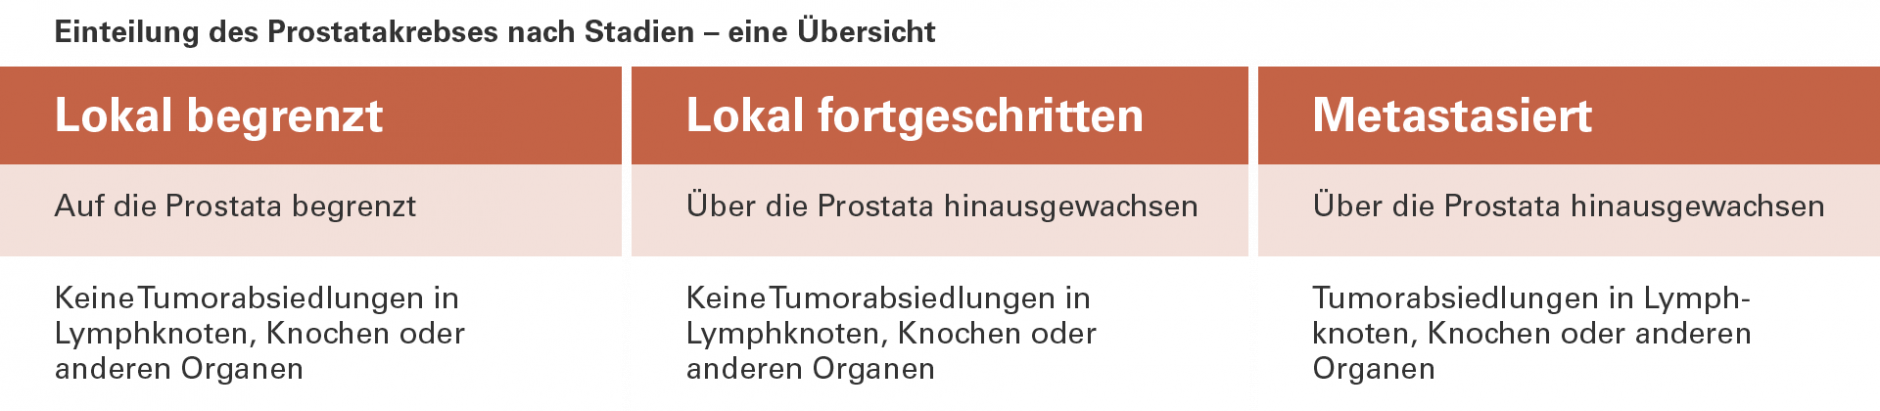 Prostatakrebs alter